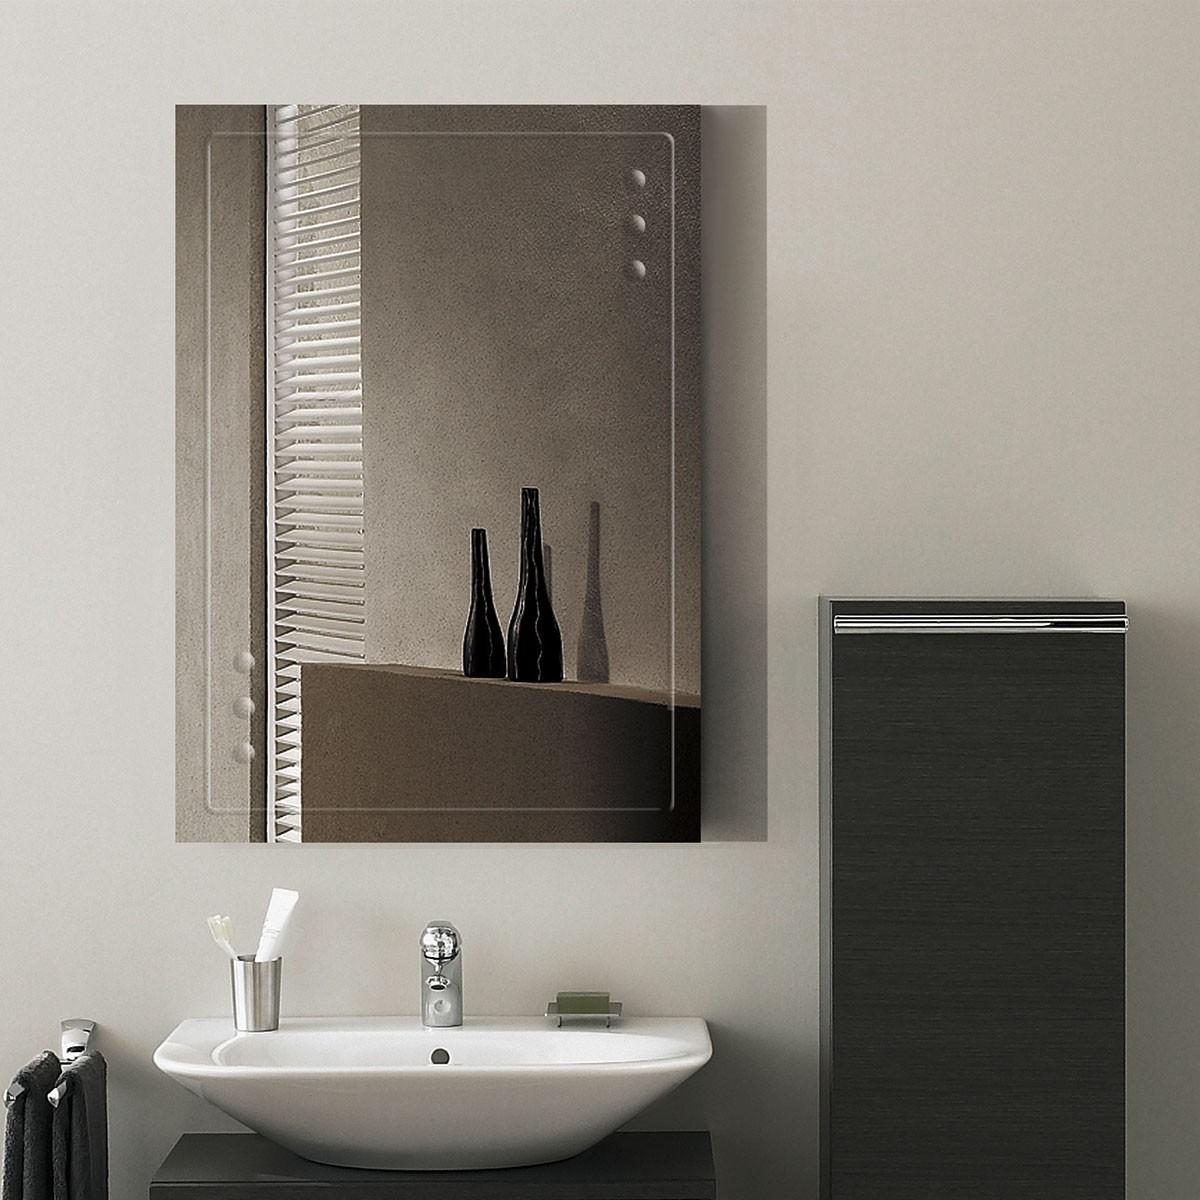 20 x 28 In. Wall-mounted Rectangle Bathroom Mirror (DK-OD-B047B)